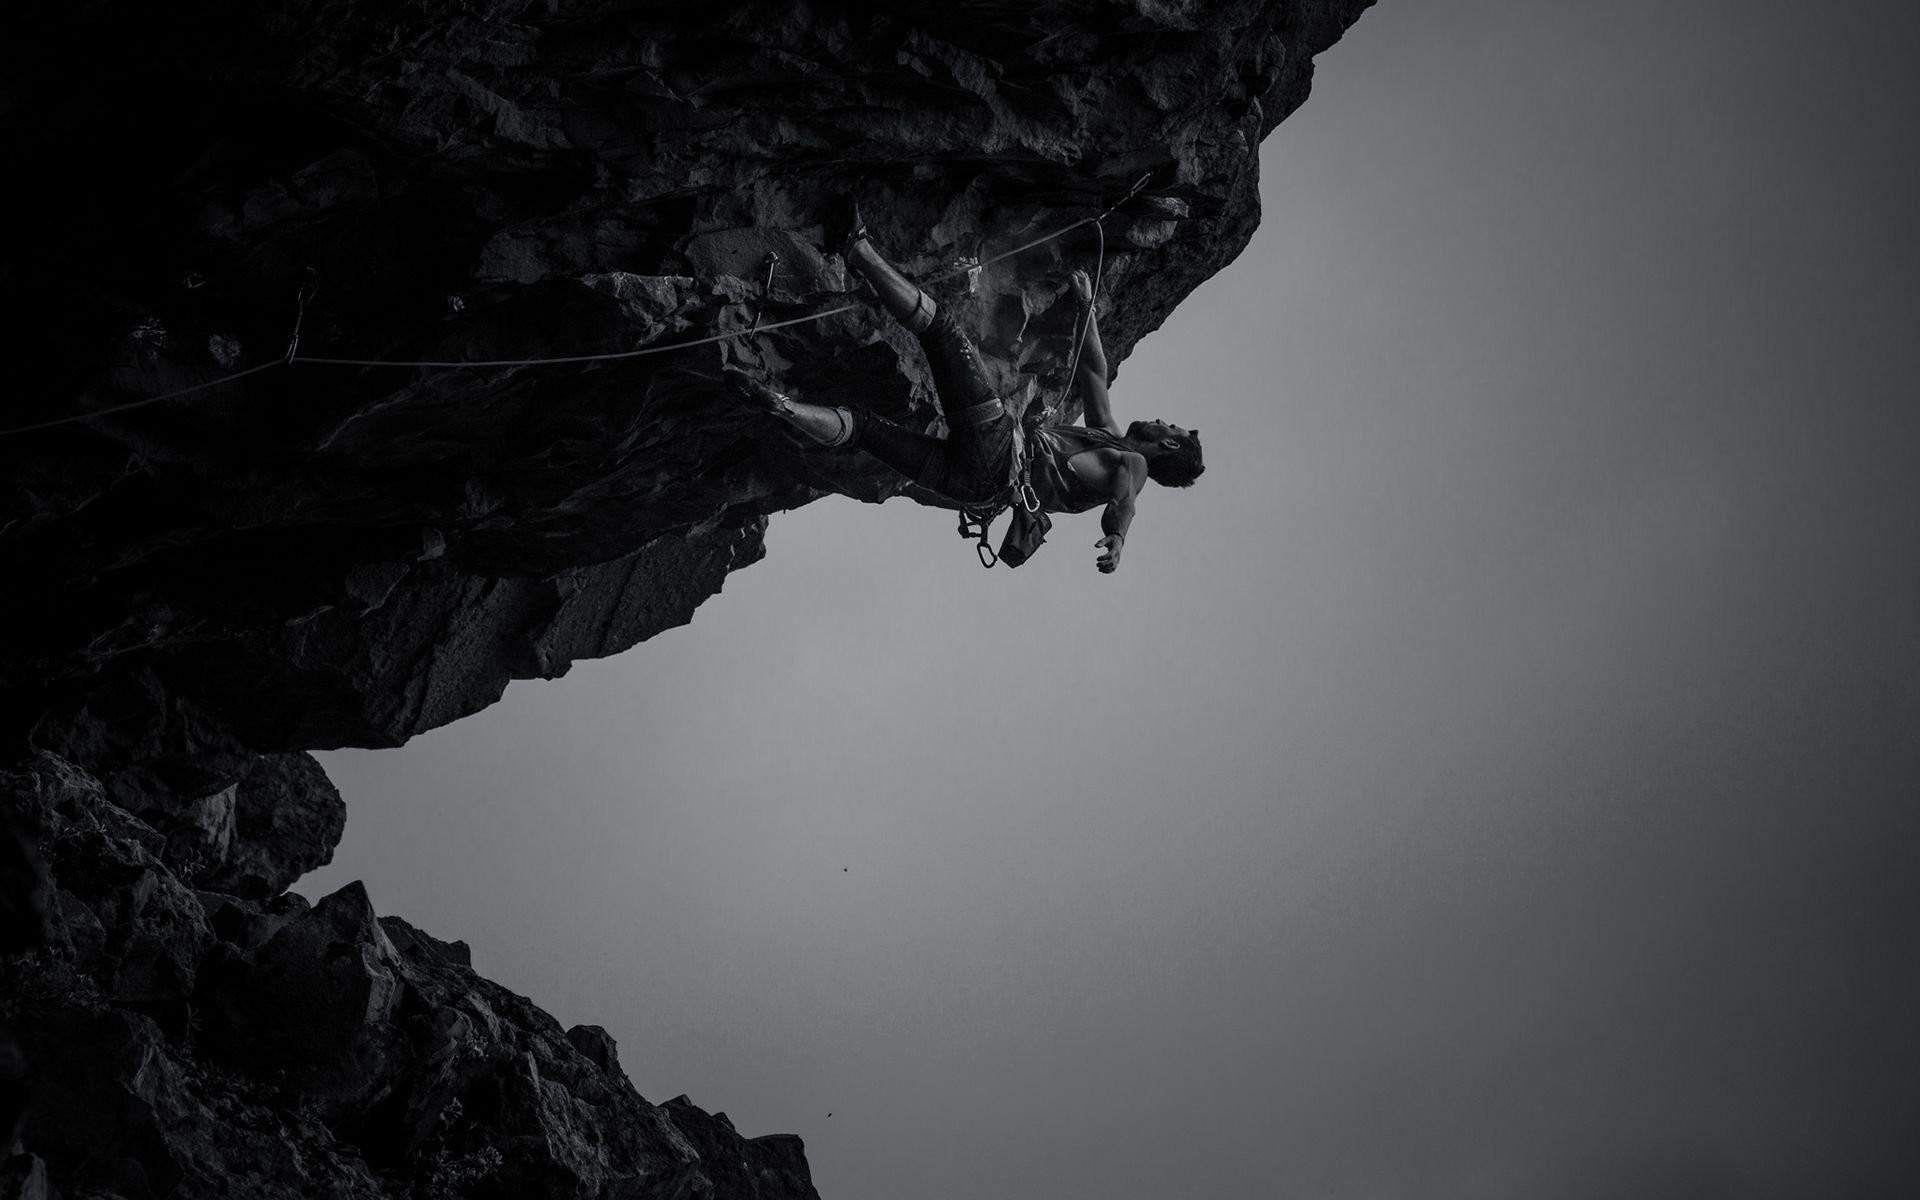 1920x1200 Monochrome Rock Climbing Wallpaper 56283